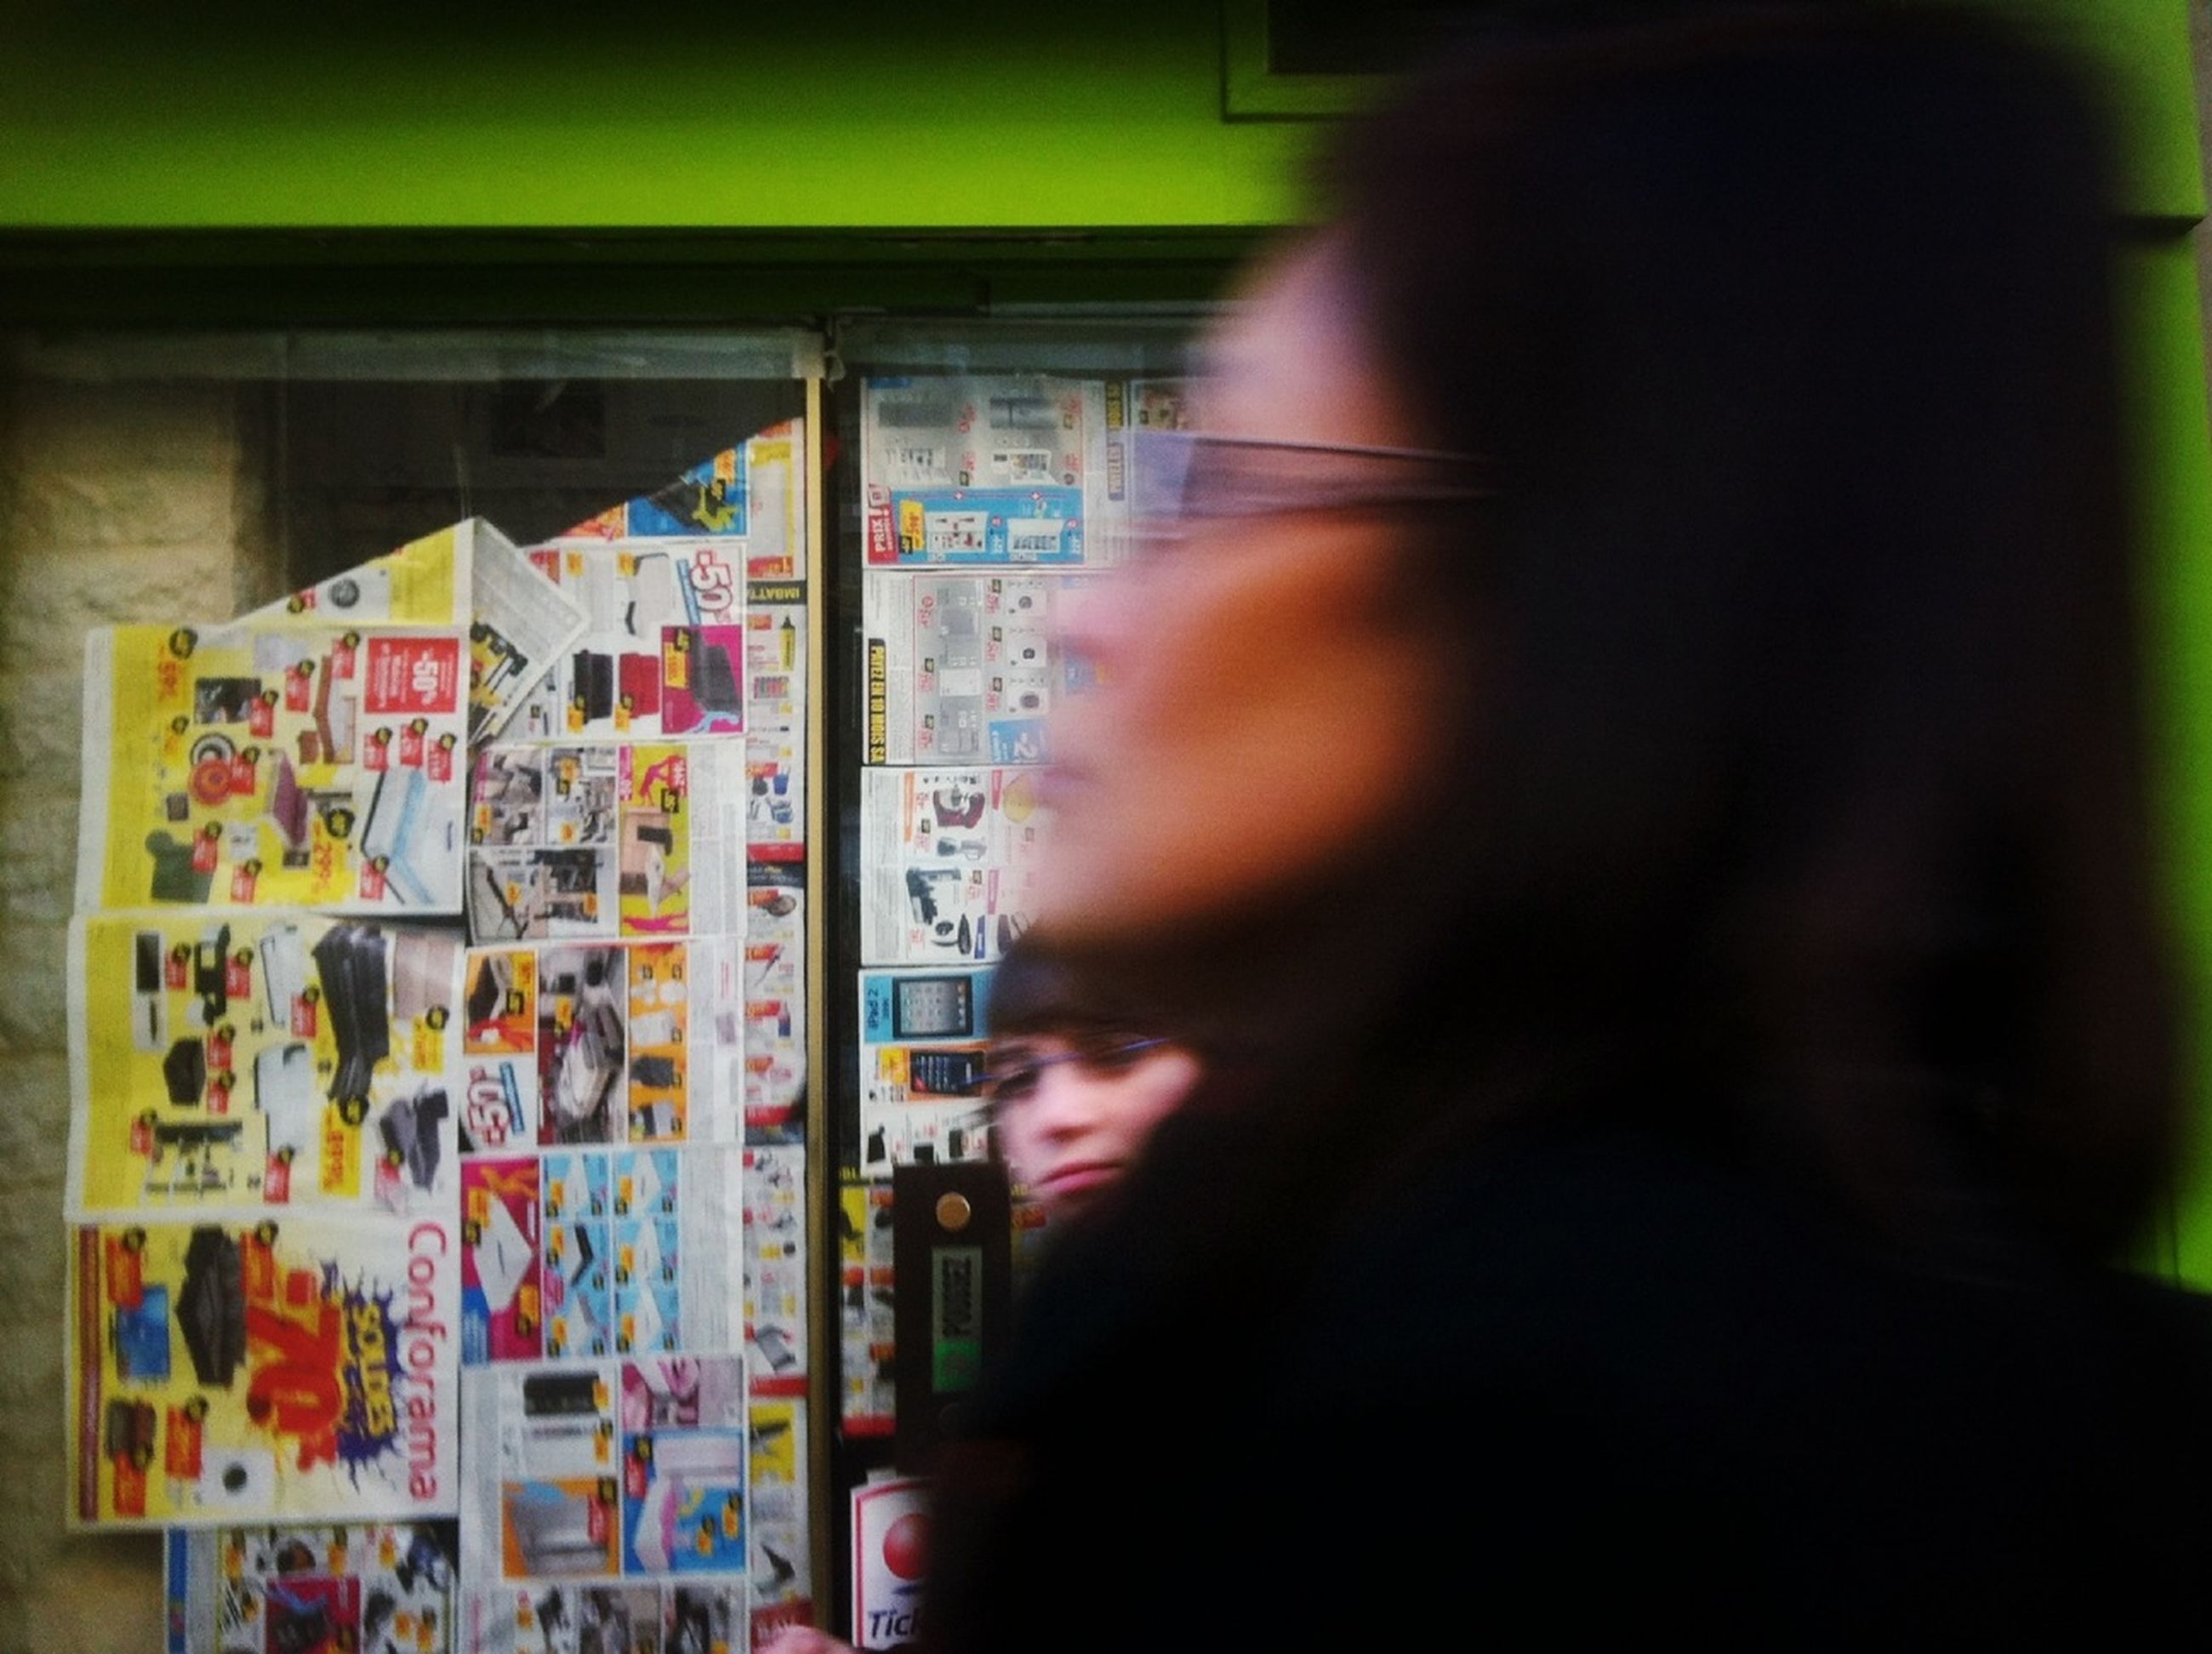 text, western script, communication, store, indoors, non-western script, retail, lifestyles, shop, men, person, architecture, display, market, built structure, shopping, variation, choice